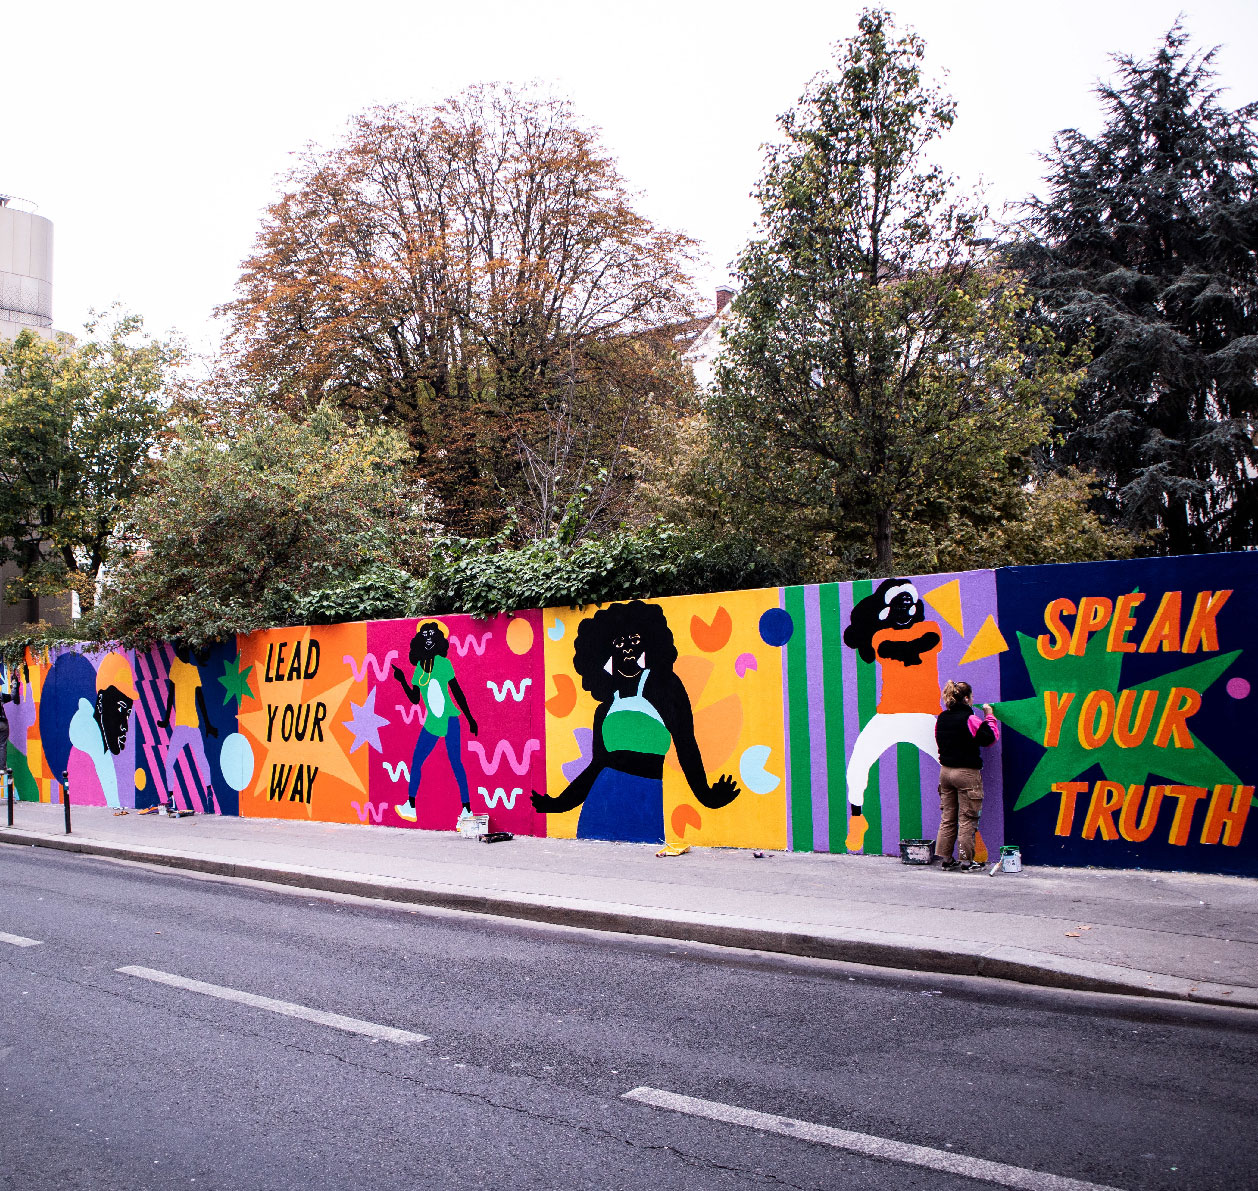 mural, wal art, street art, paris, art azoï, ménilmontant, painting, acrylic